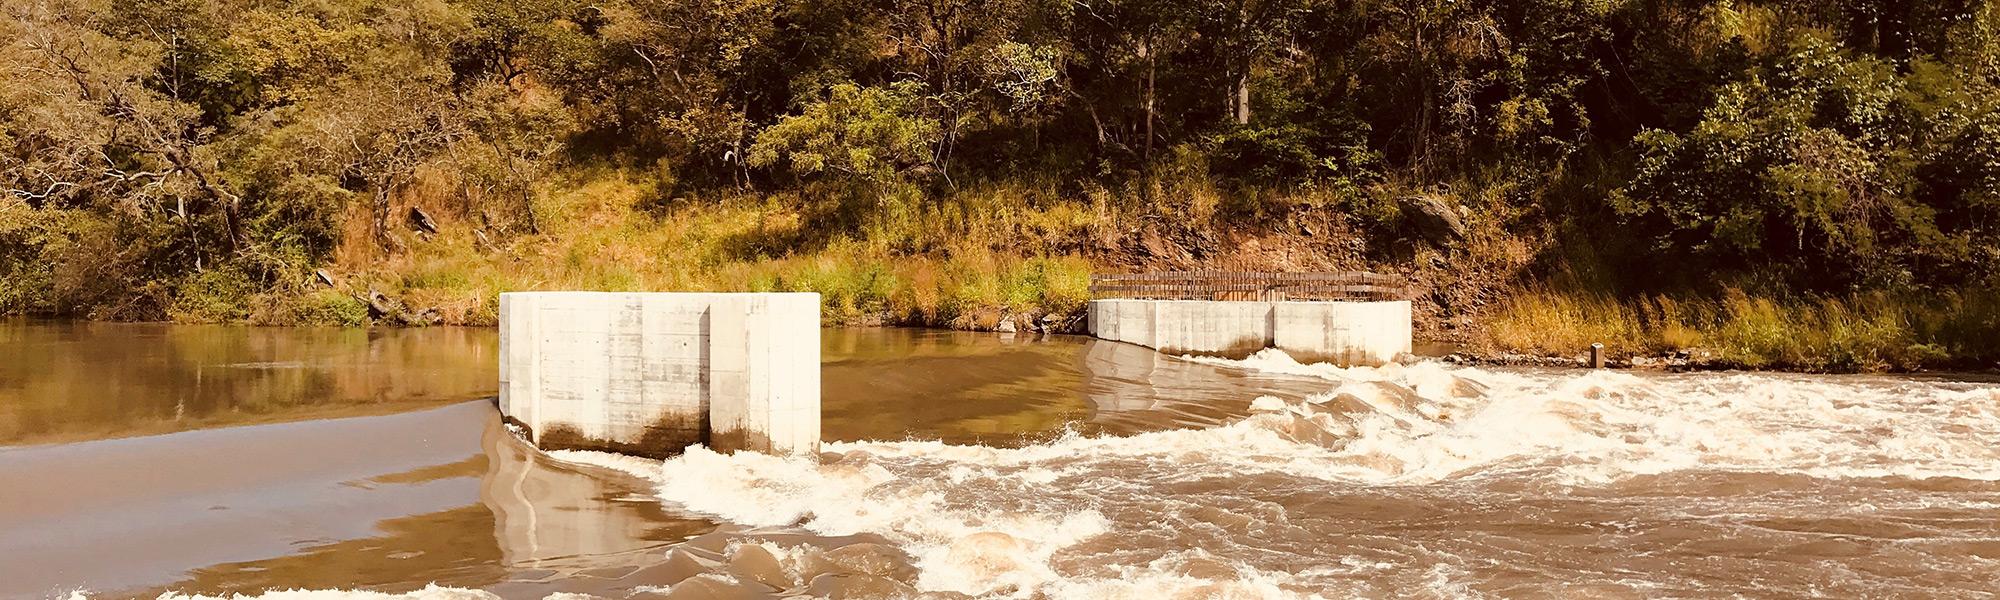 Achwa River